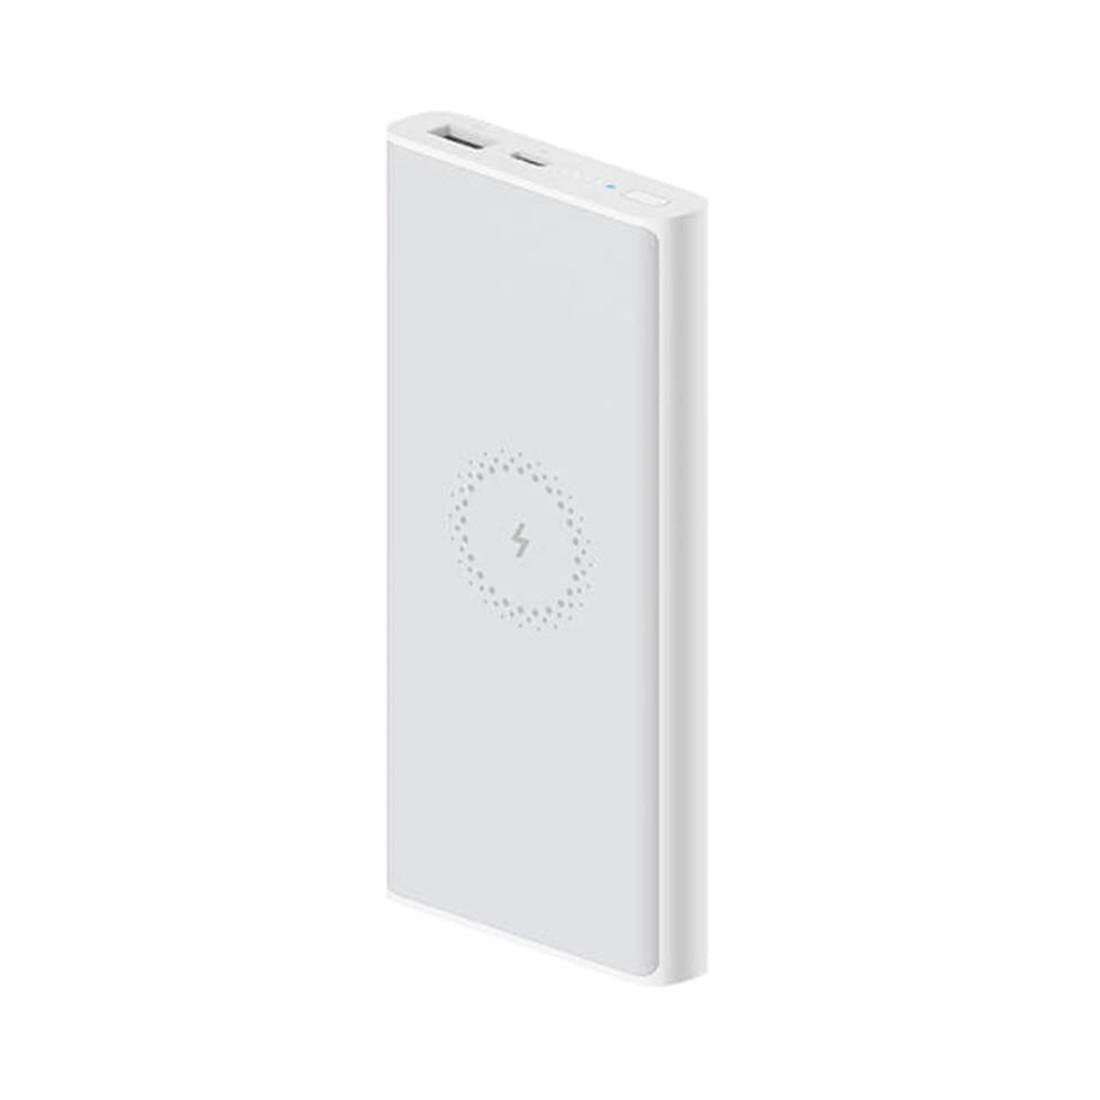 Зарядное устройство Xiaomi Mi Power Bank 10000mAh Wireless Essential Белый